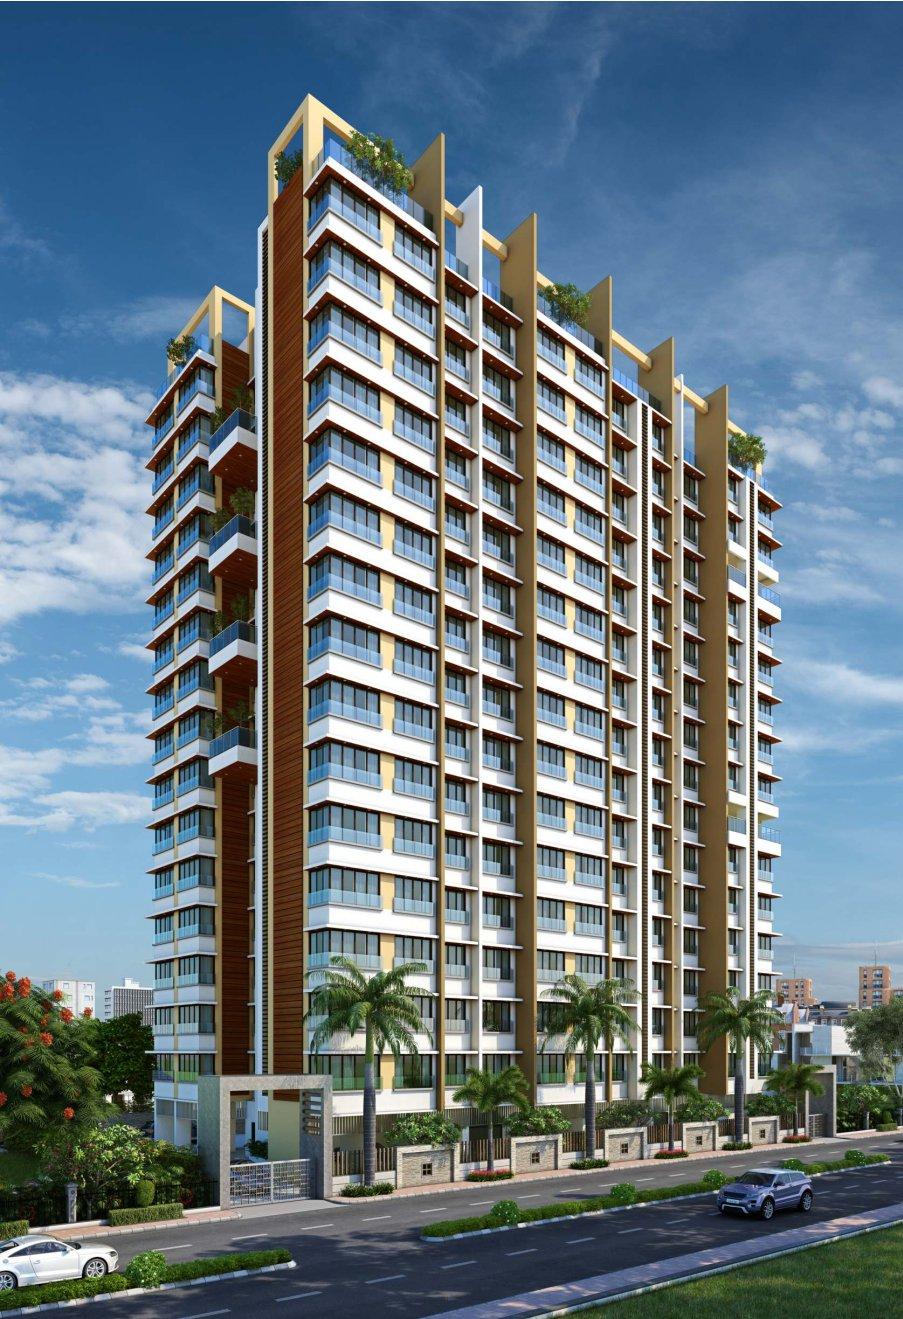 2 BHK Flats & Shops in Chembur East in Kyraa Ariso Apartment